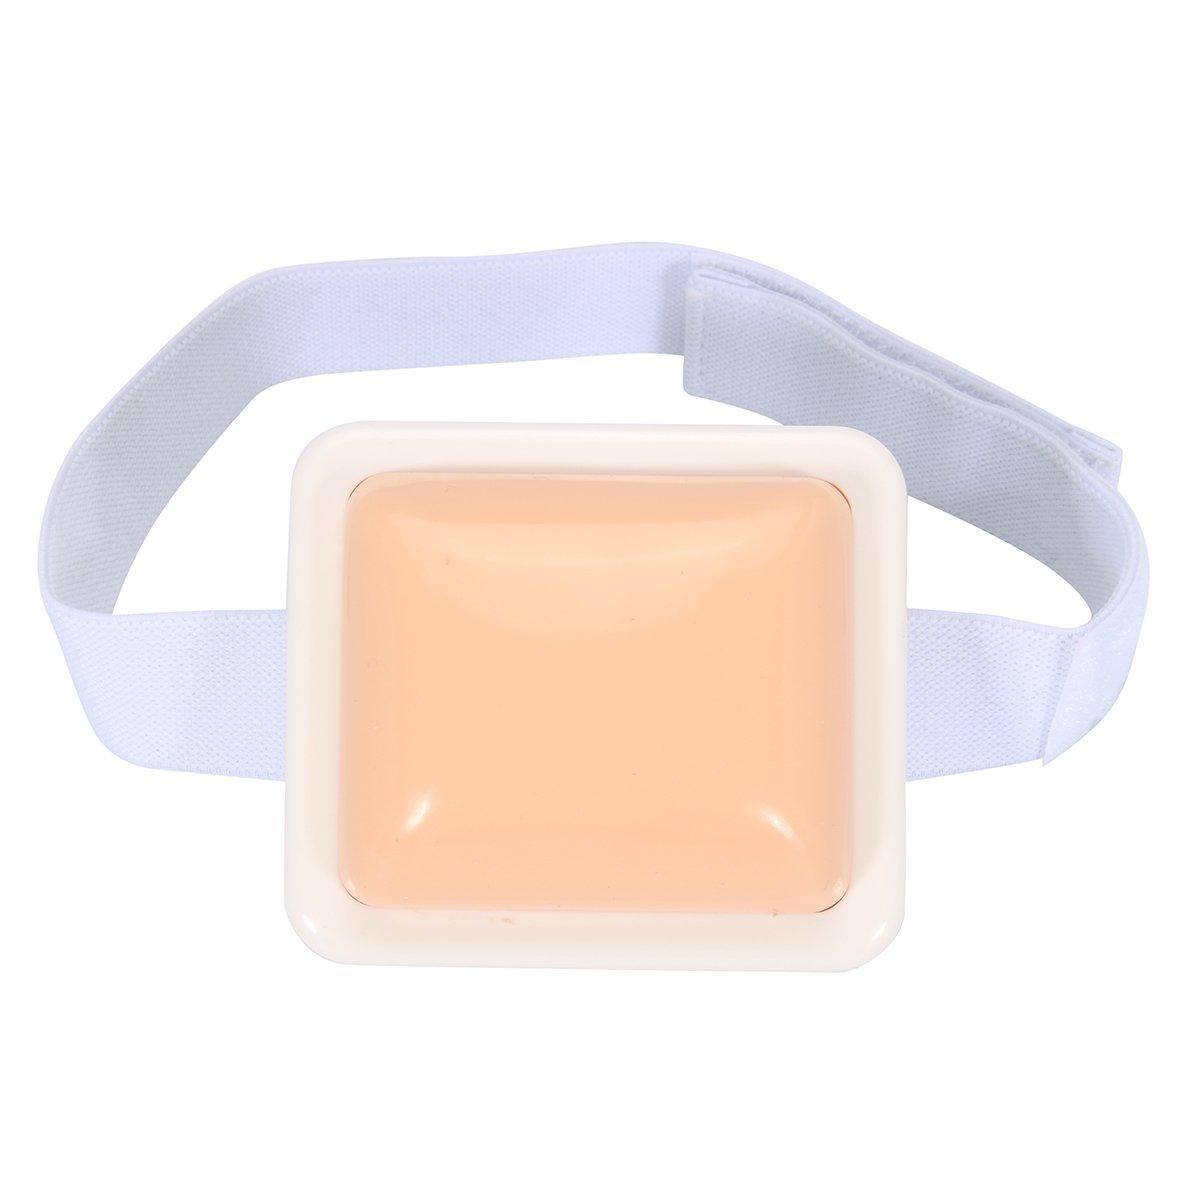 Sonsan plastica iniezione intramuscolare training Pad Pads per infermiere Trainning pratica strumento